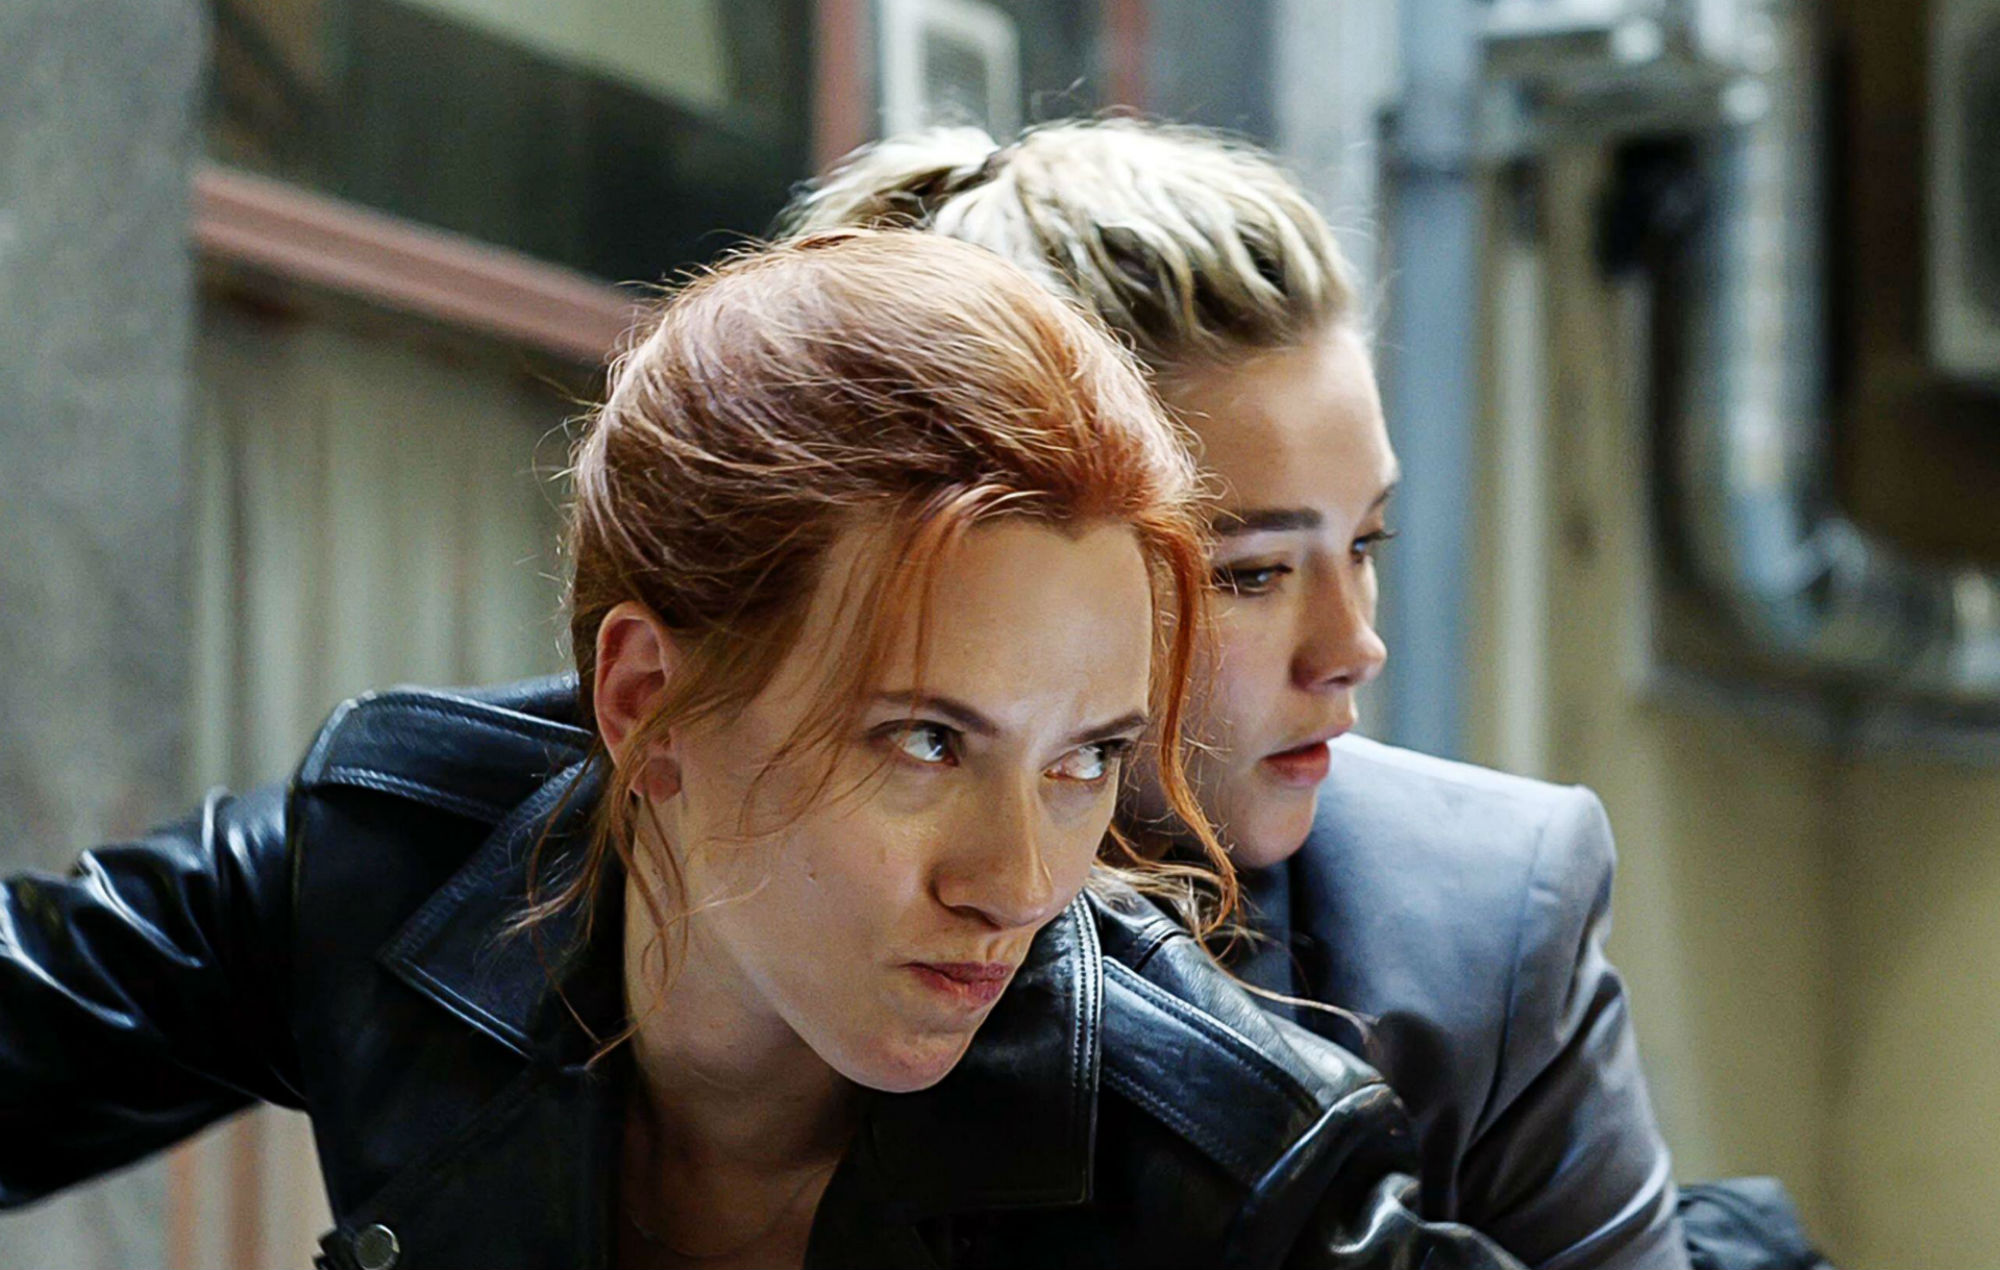 Scarlett Johansson and Florence Pugh shot 'Black Widow' with pneumonia